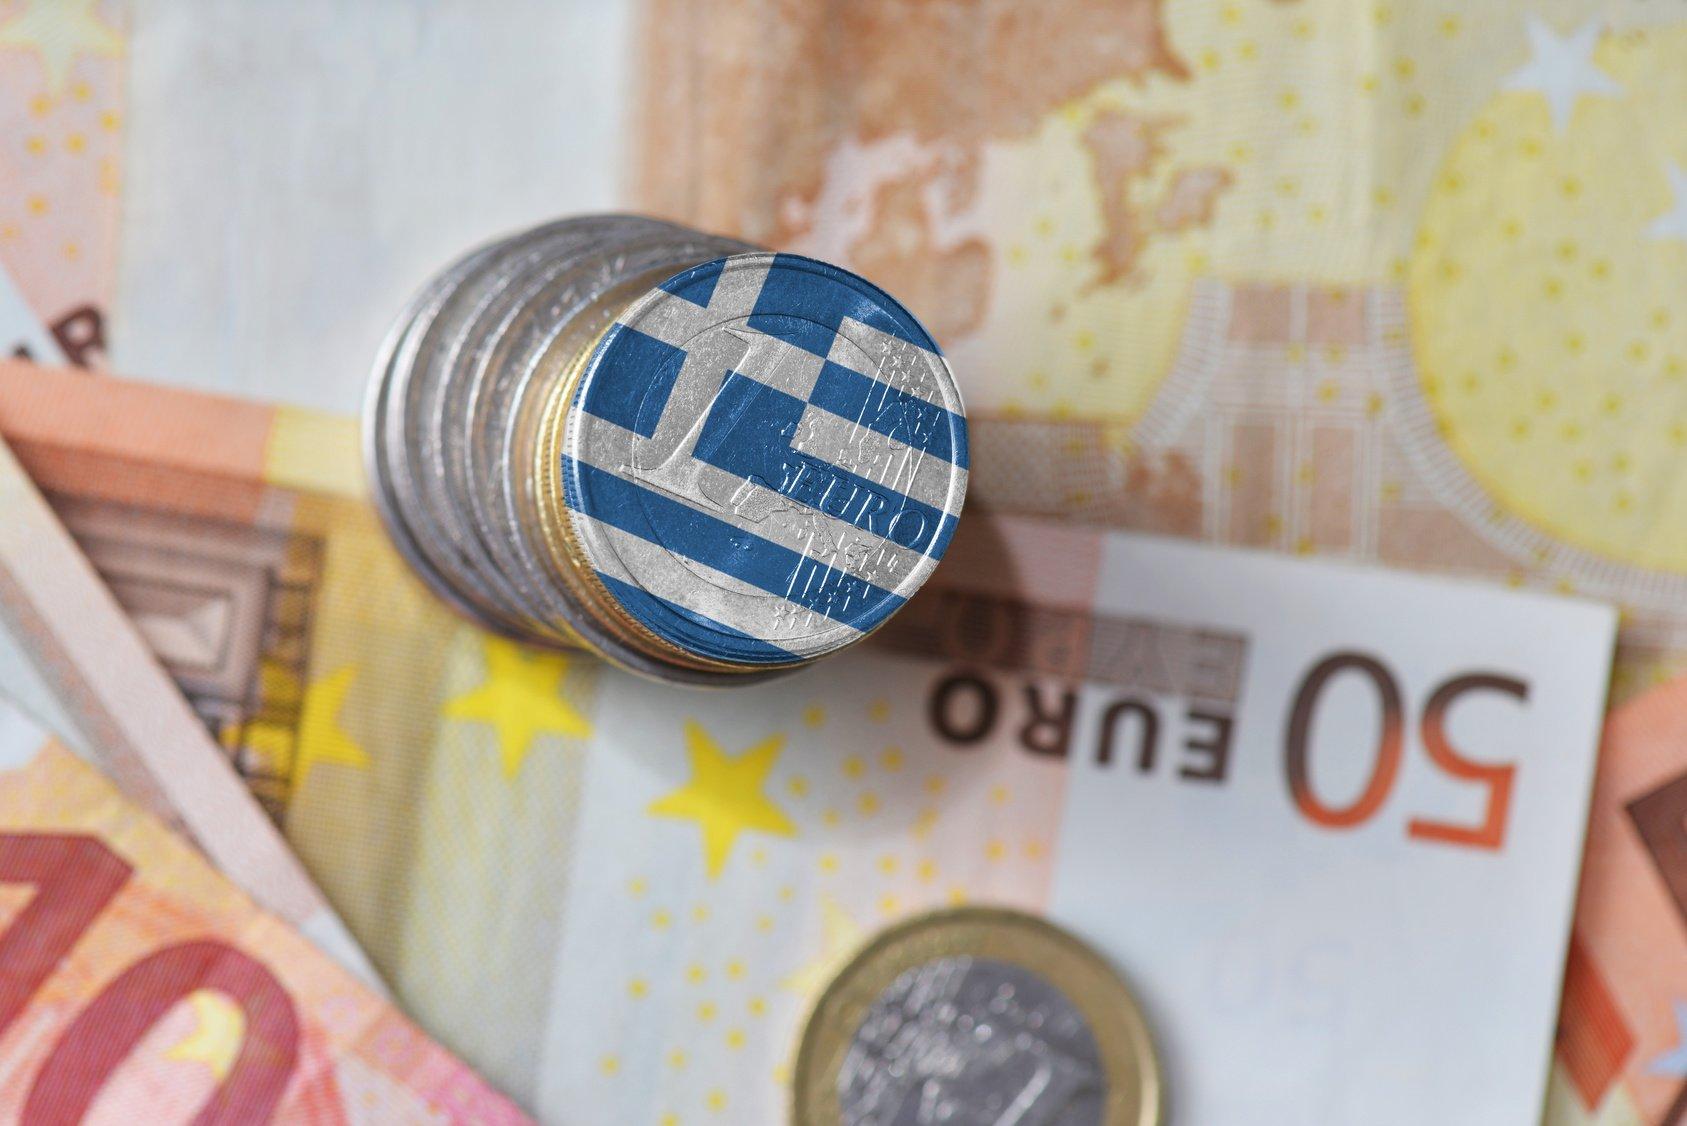 Grčka: Poreski prihodi beleže rekordan pad od 7,4%